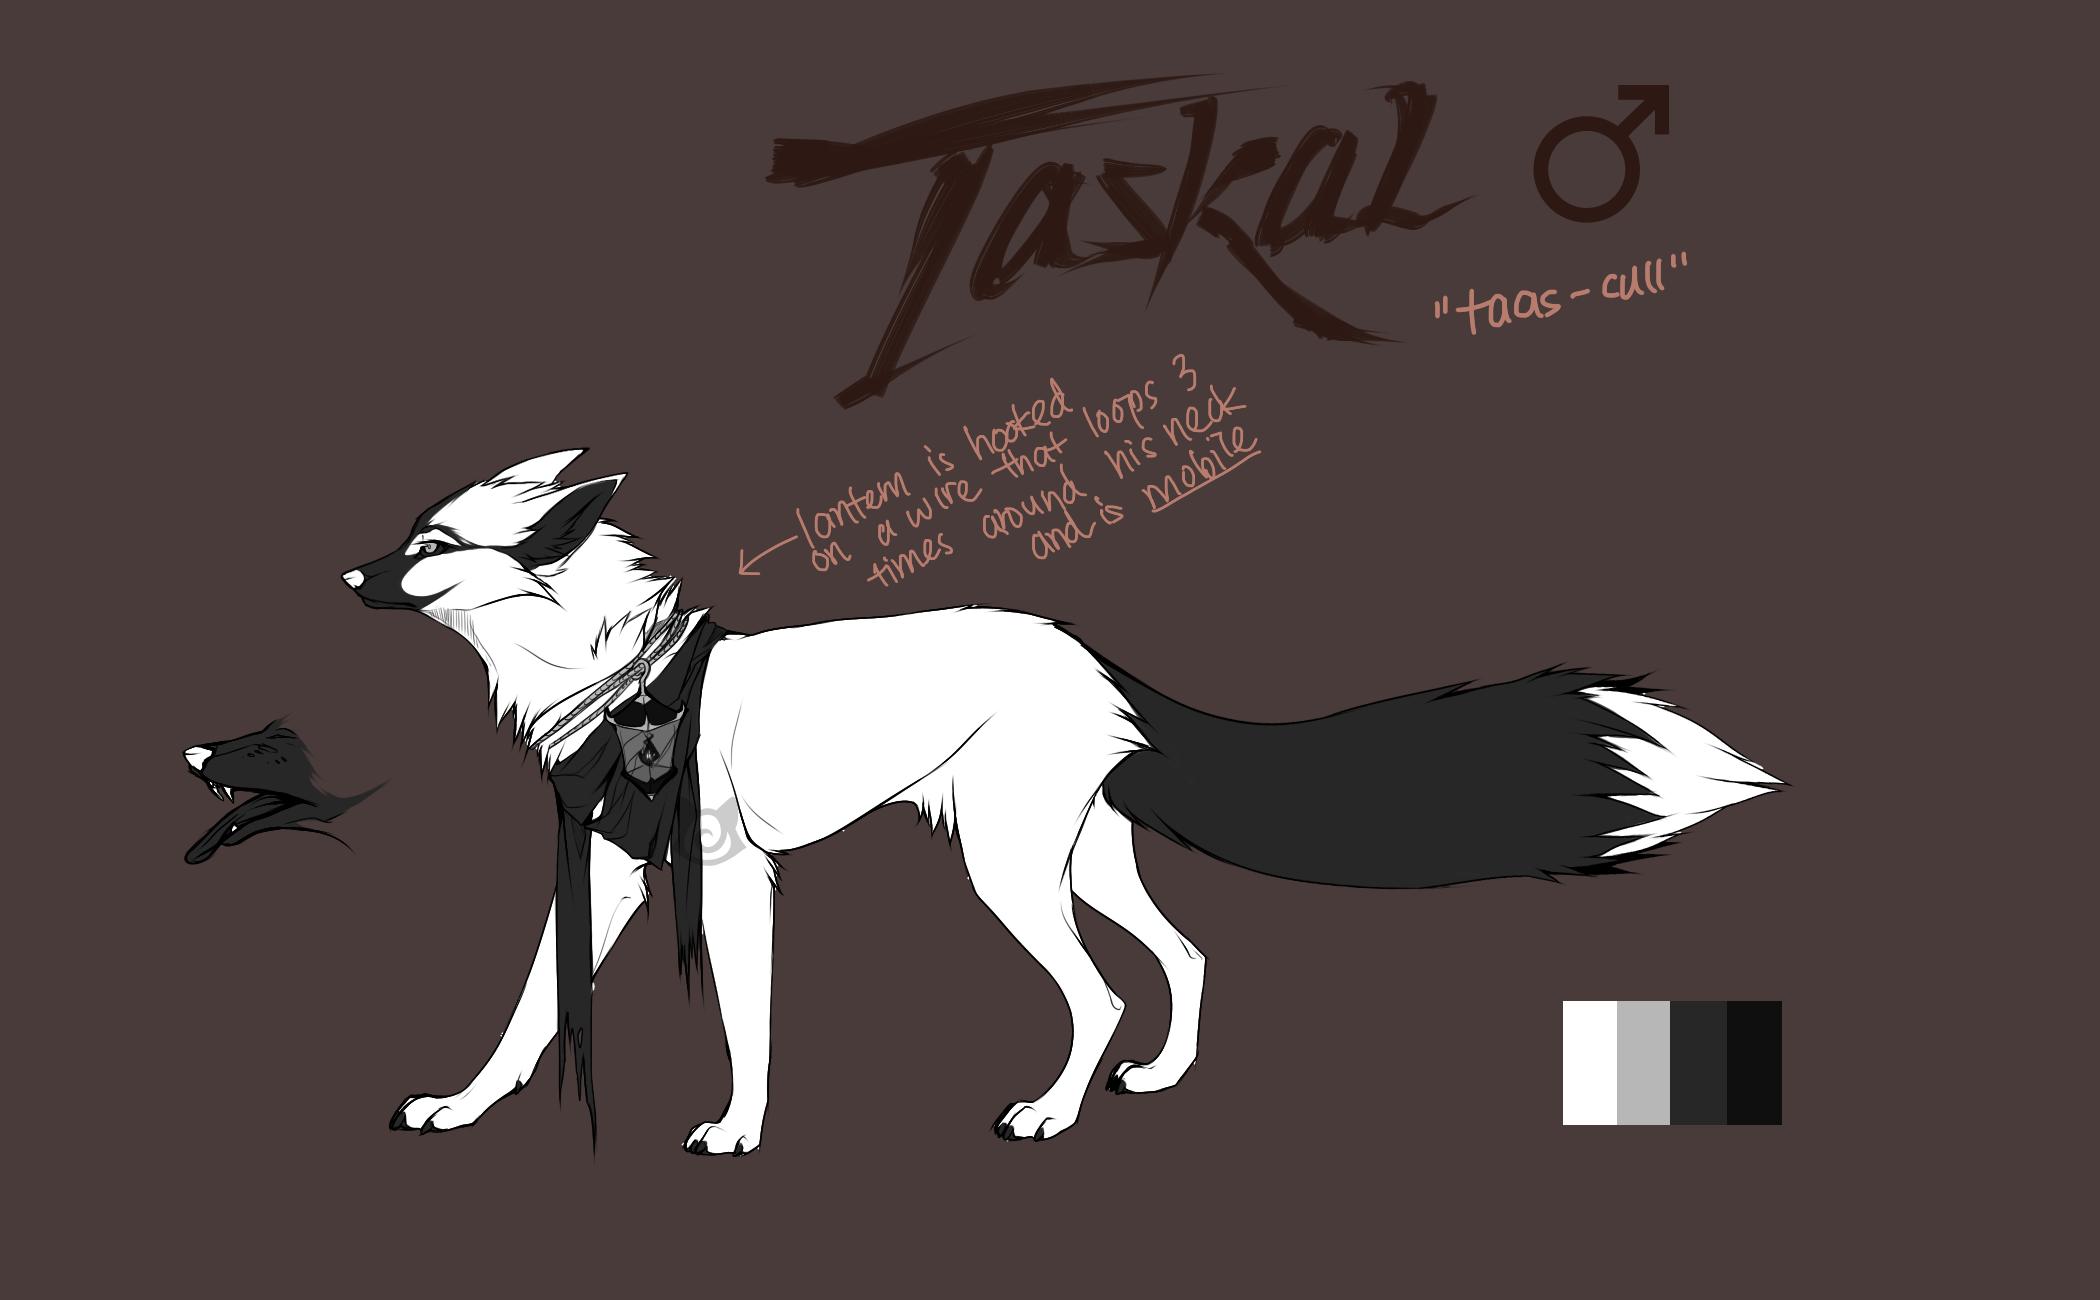 Taskal by Capukat